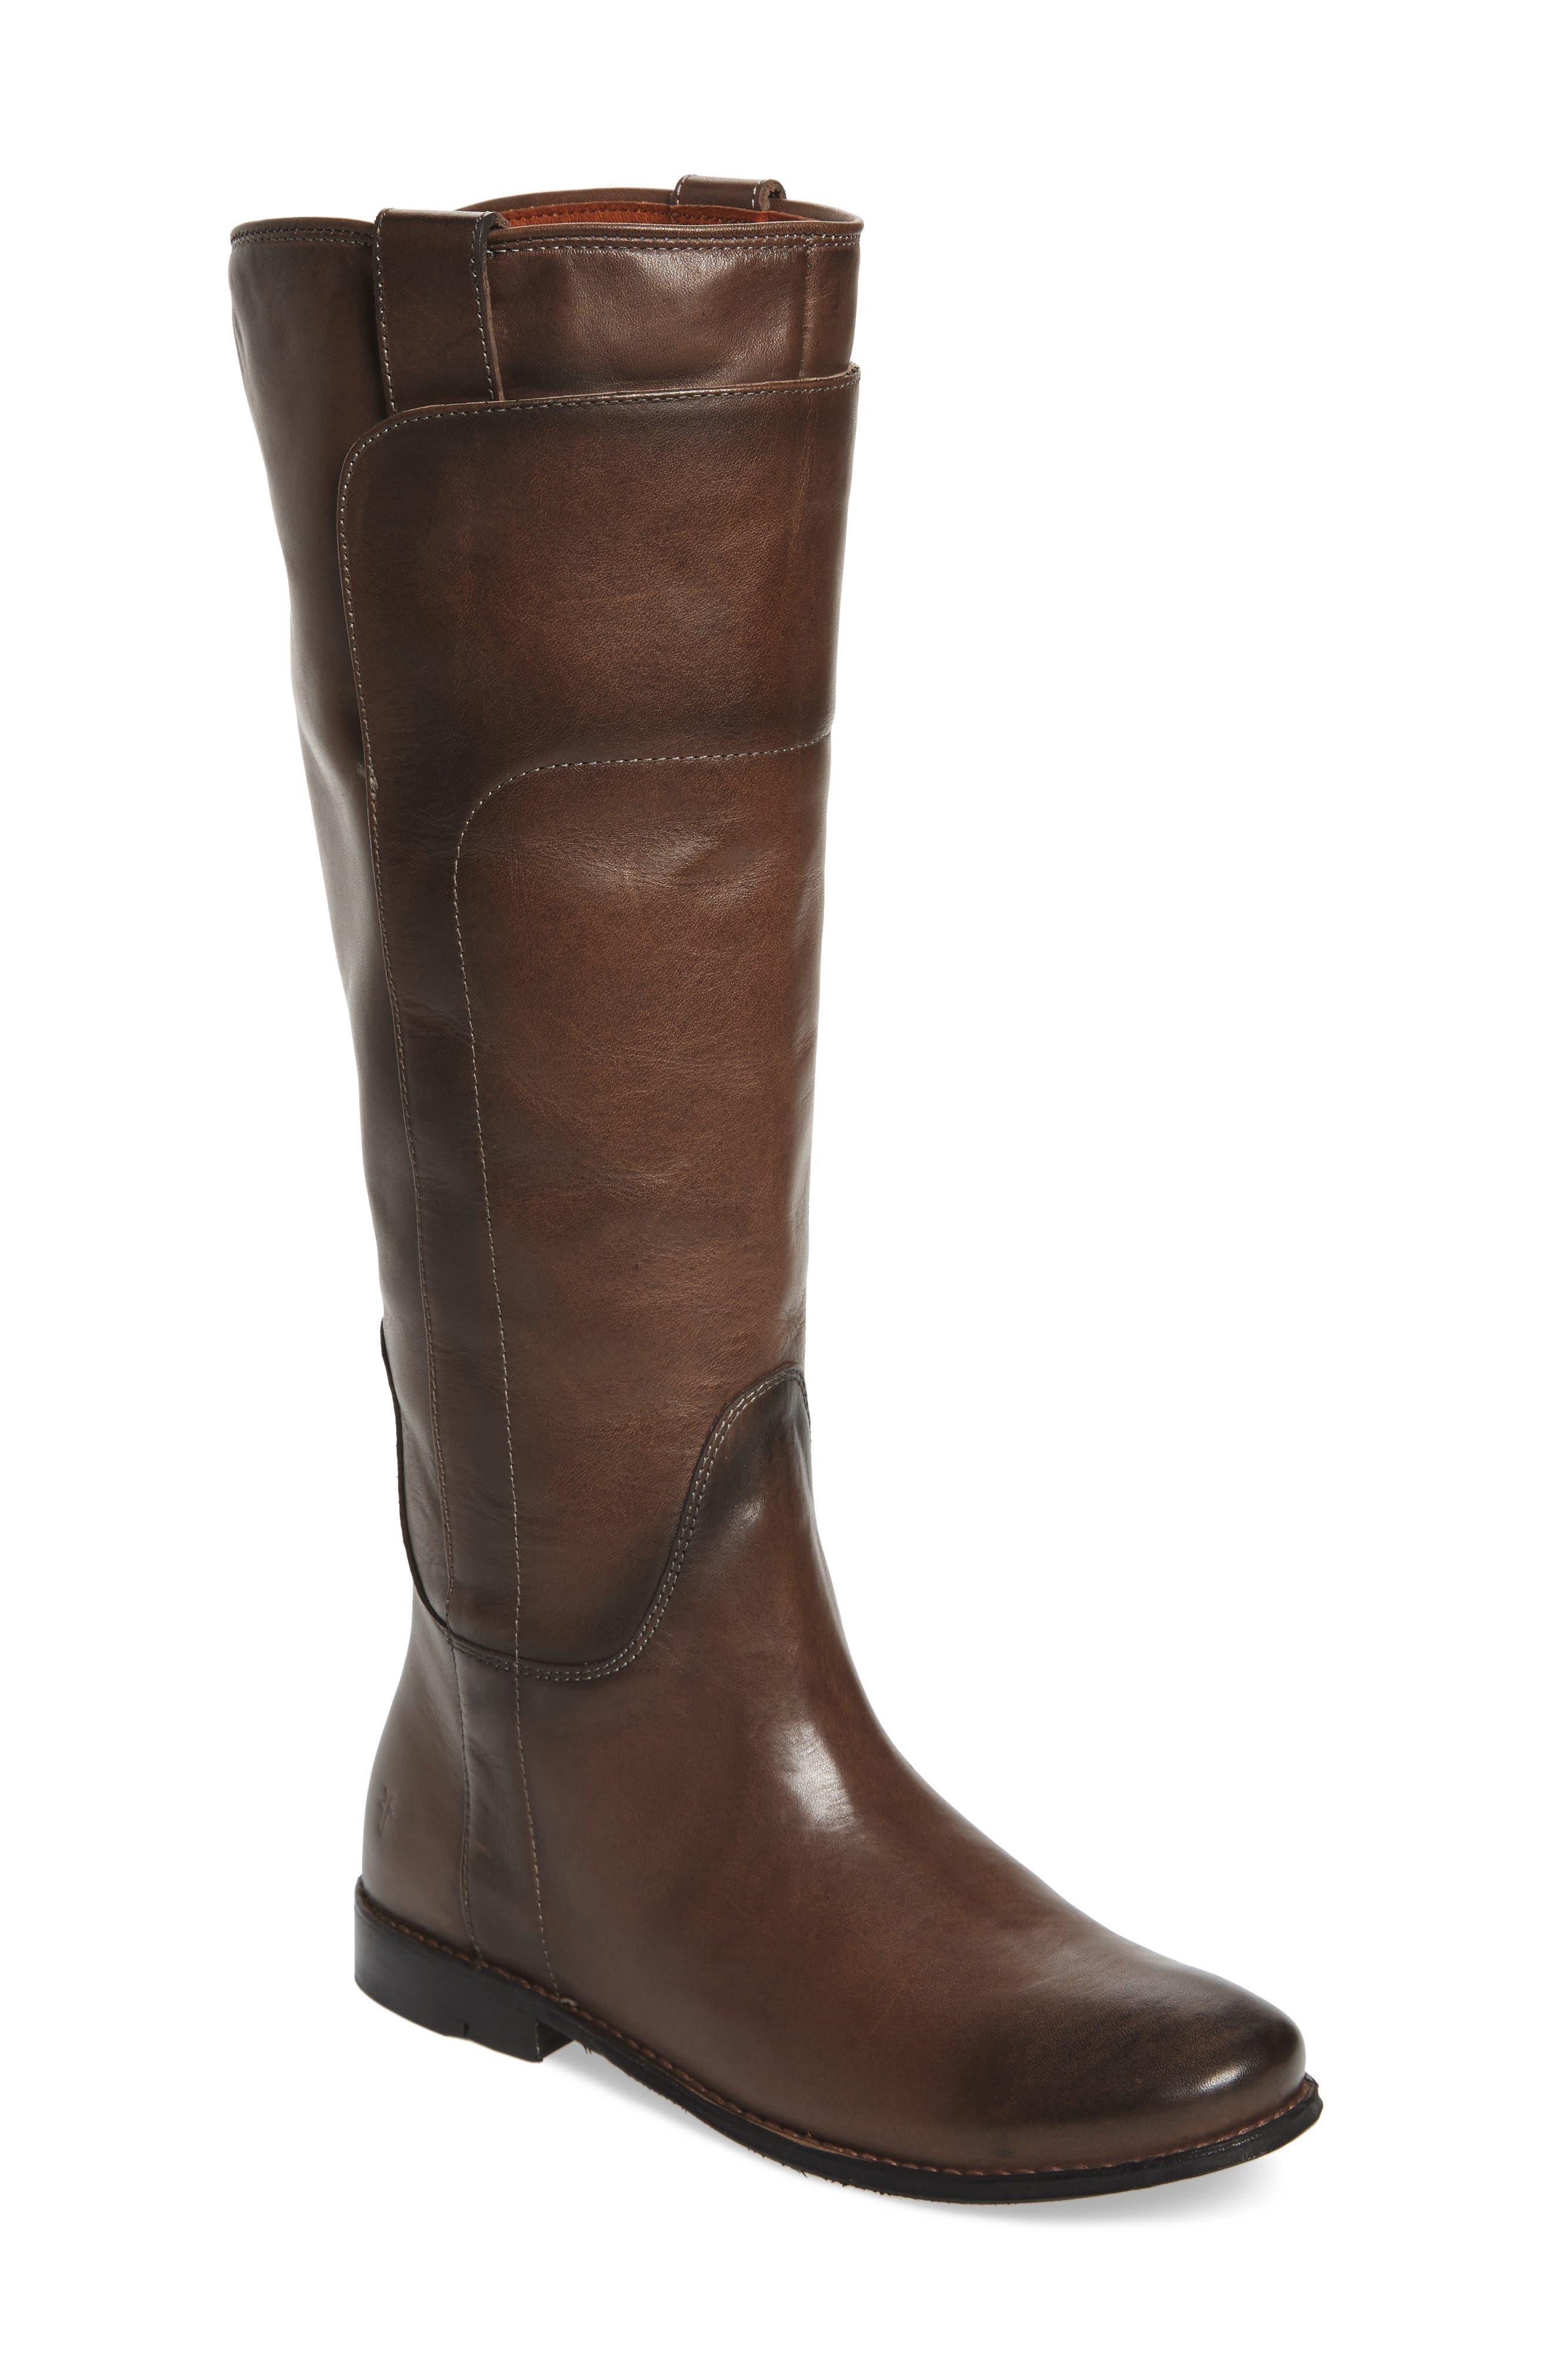 Frye Paige Tall Riding Boot (Women